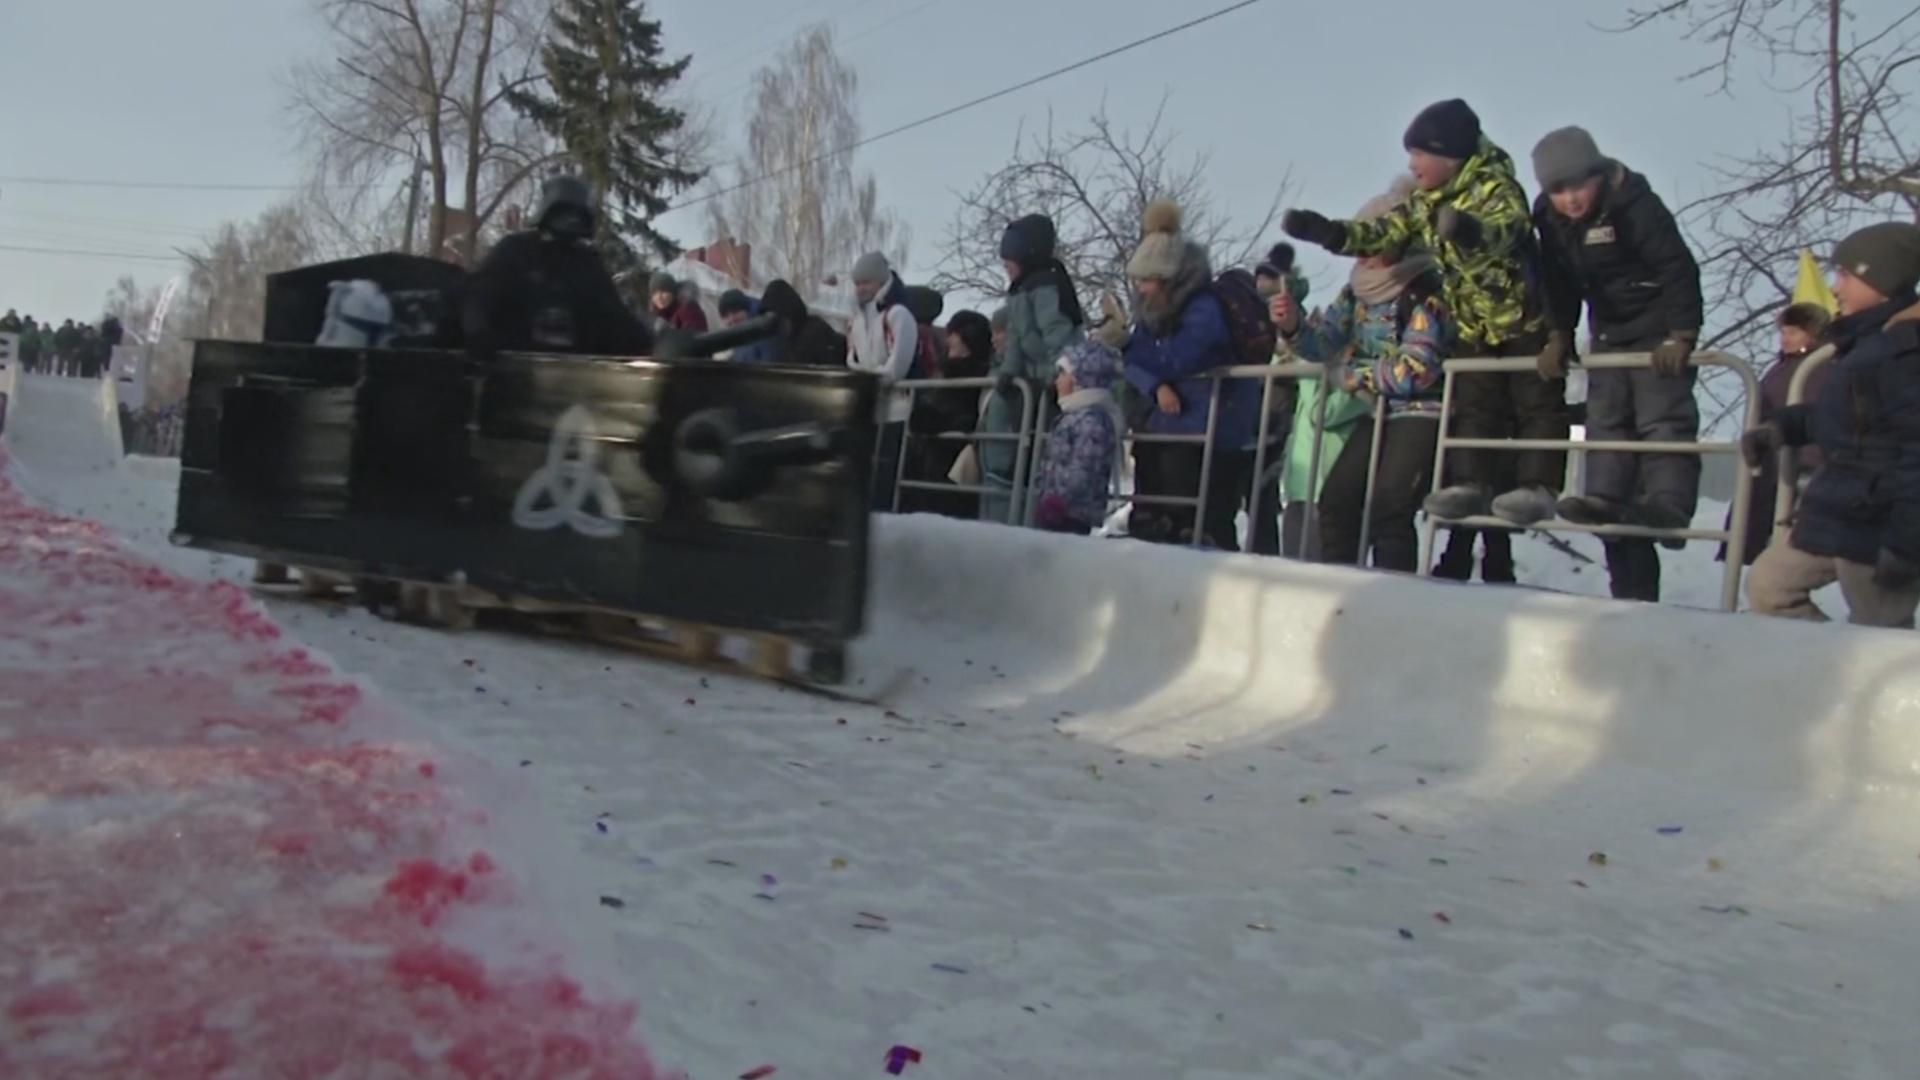 Гонки на креативных санях прошли в Татарстане